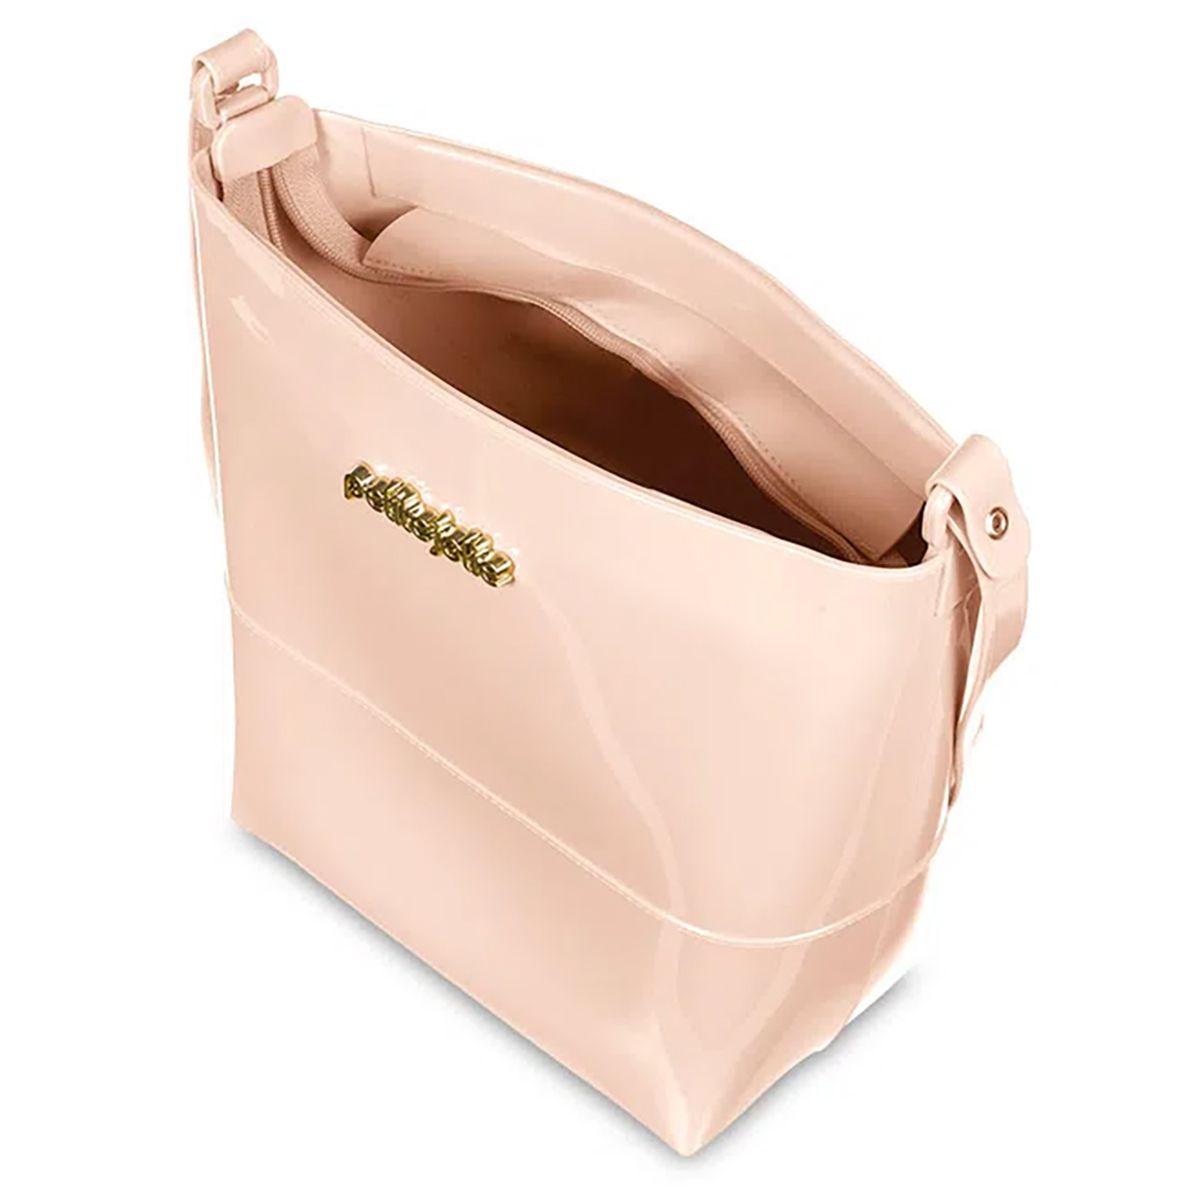 Bolsa Petite Jolie PJ4117 Easy